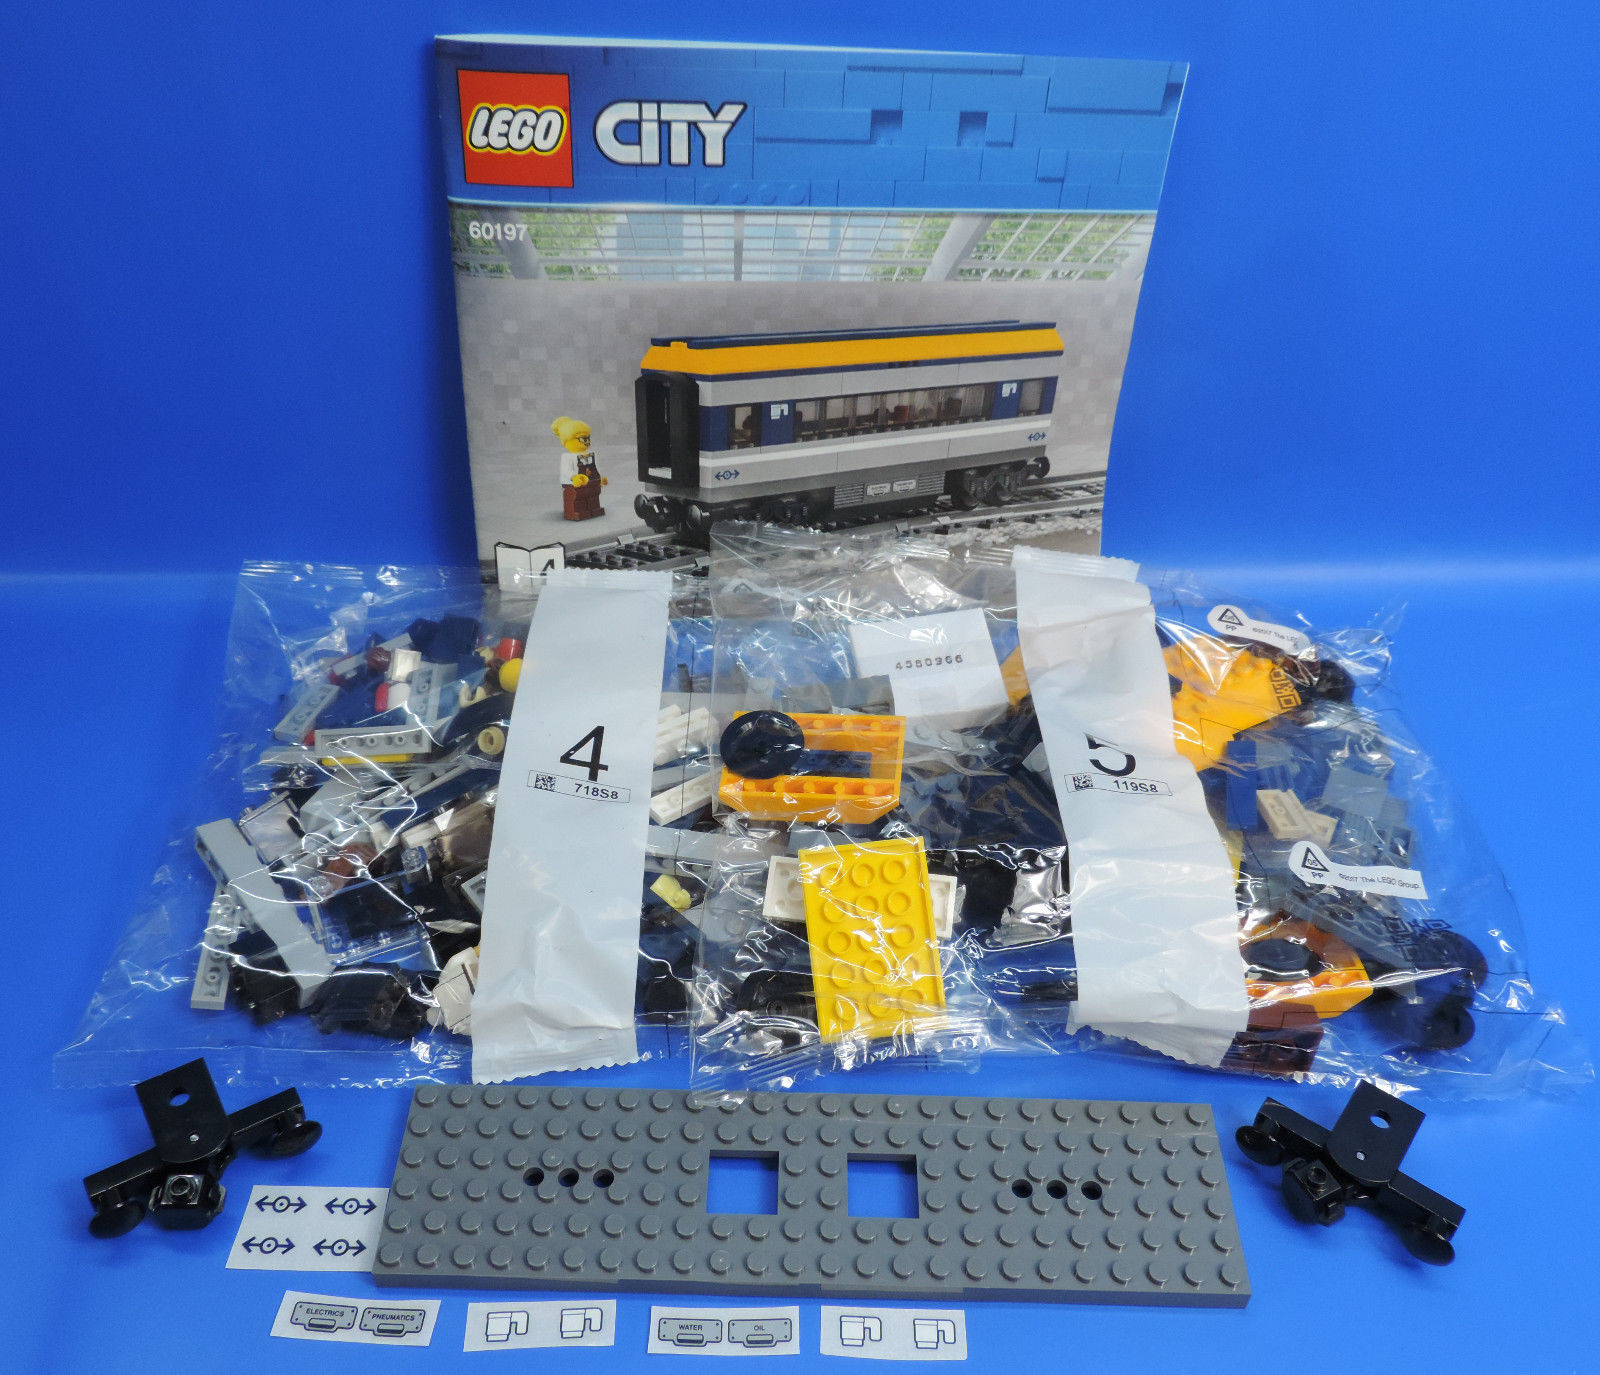 LEGO ® 60197 chemin de de de fer 2x œ Wagon moyens Wagon bordcafé restaurant 8427c5